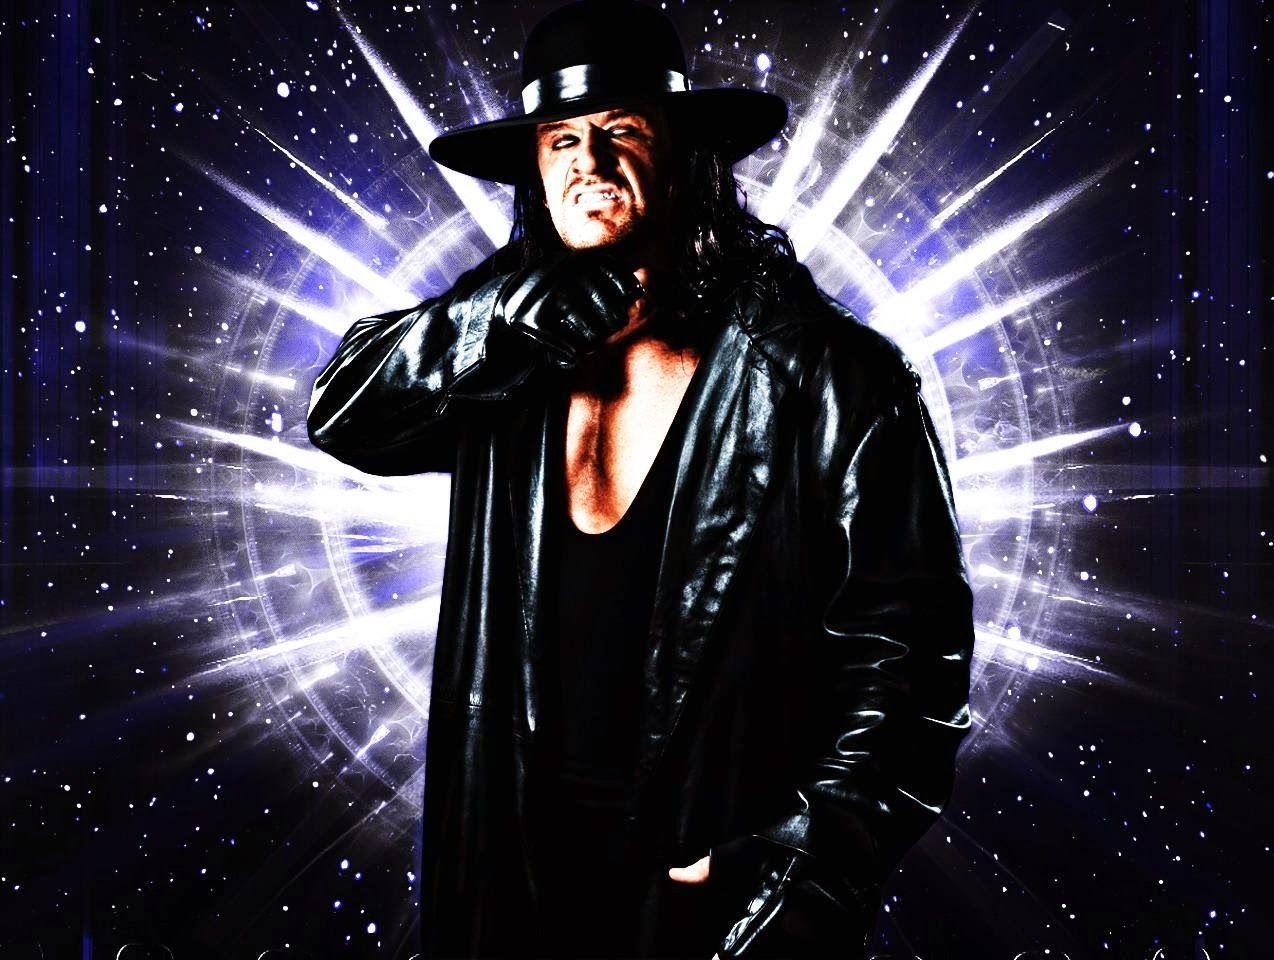 Undertaker Wallpapers 2017